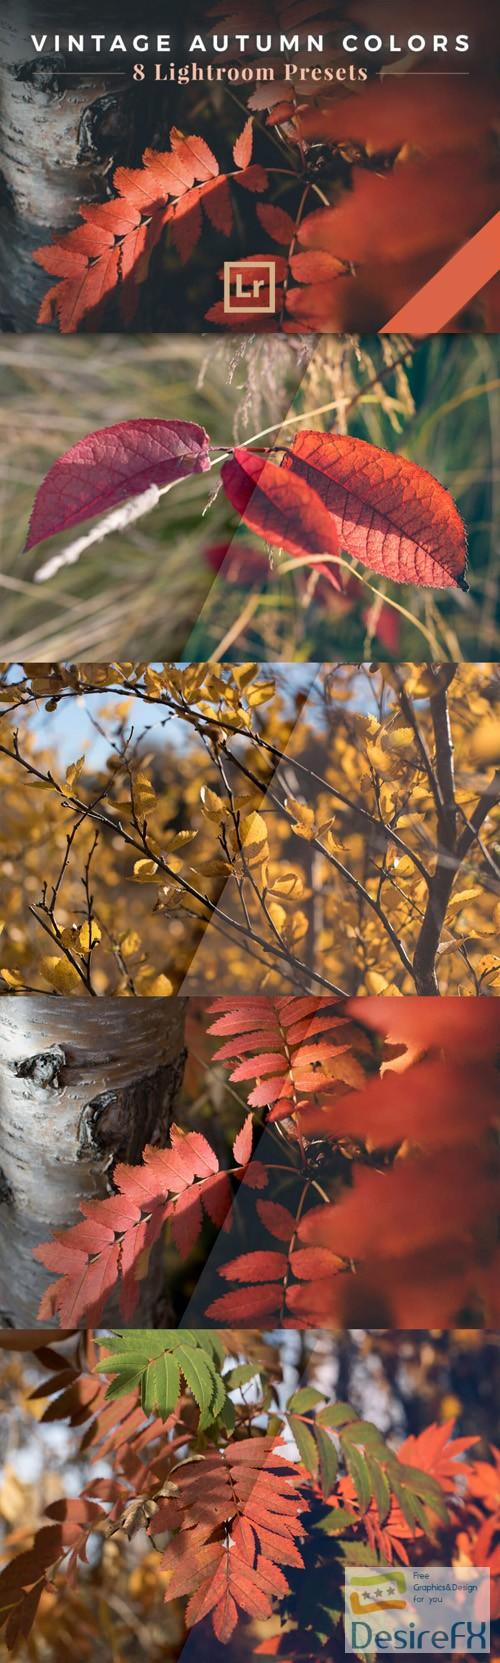 photoshop - Vintage Autumn Colors - 8 Lightroom Presets [JPEG/RAW]